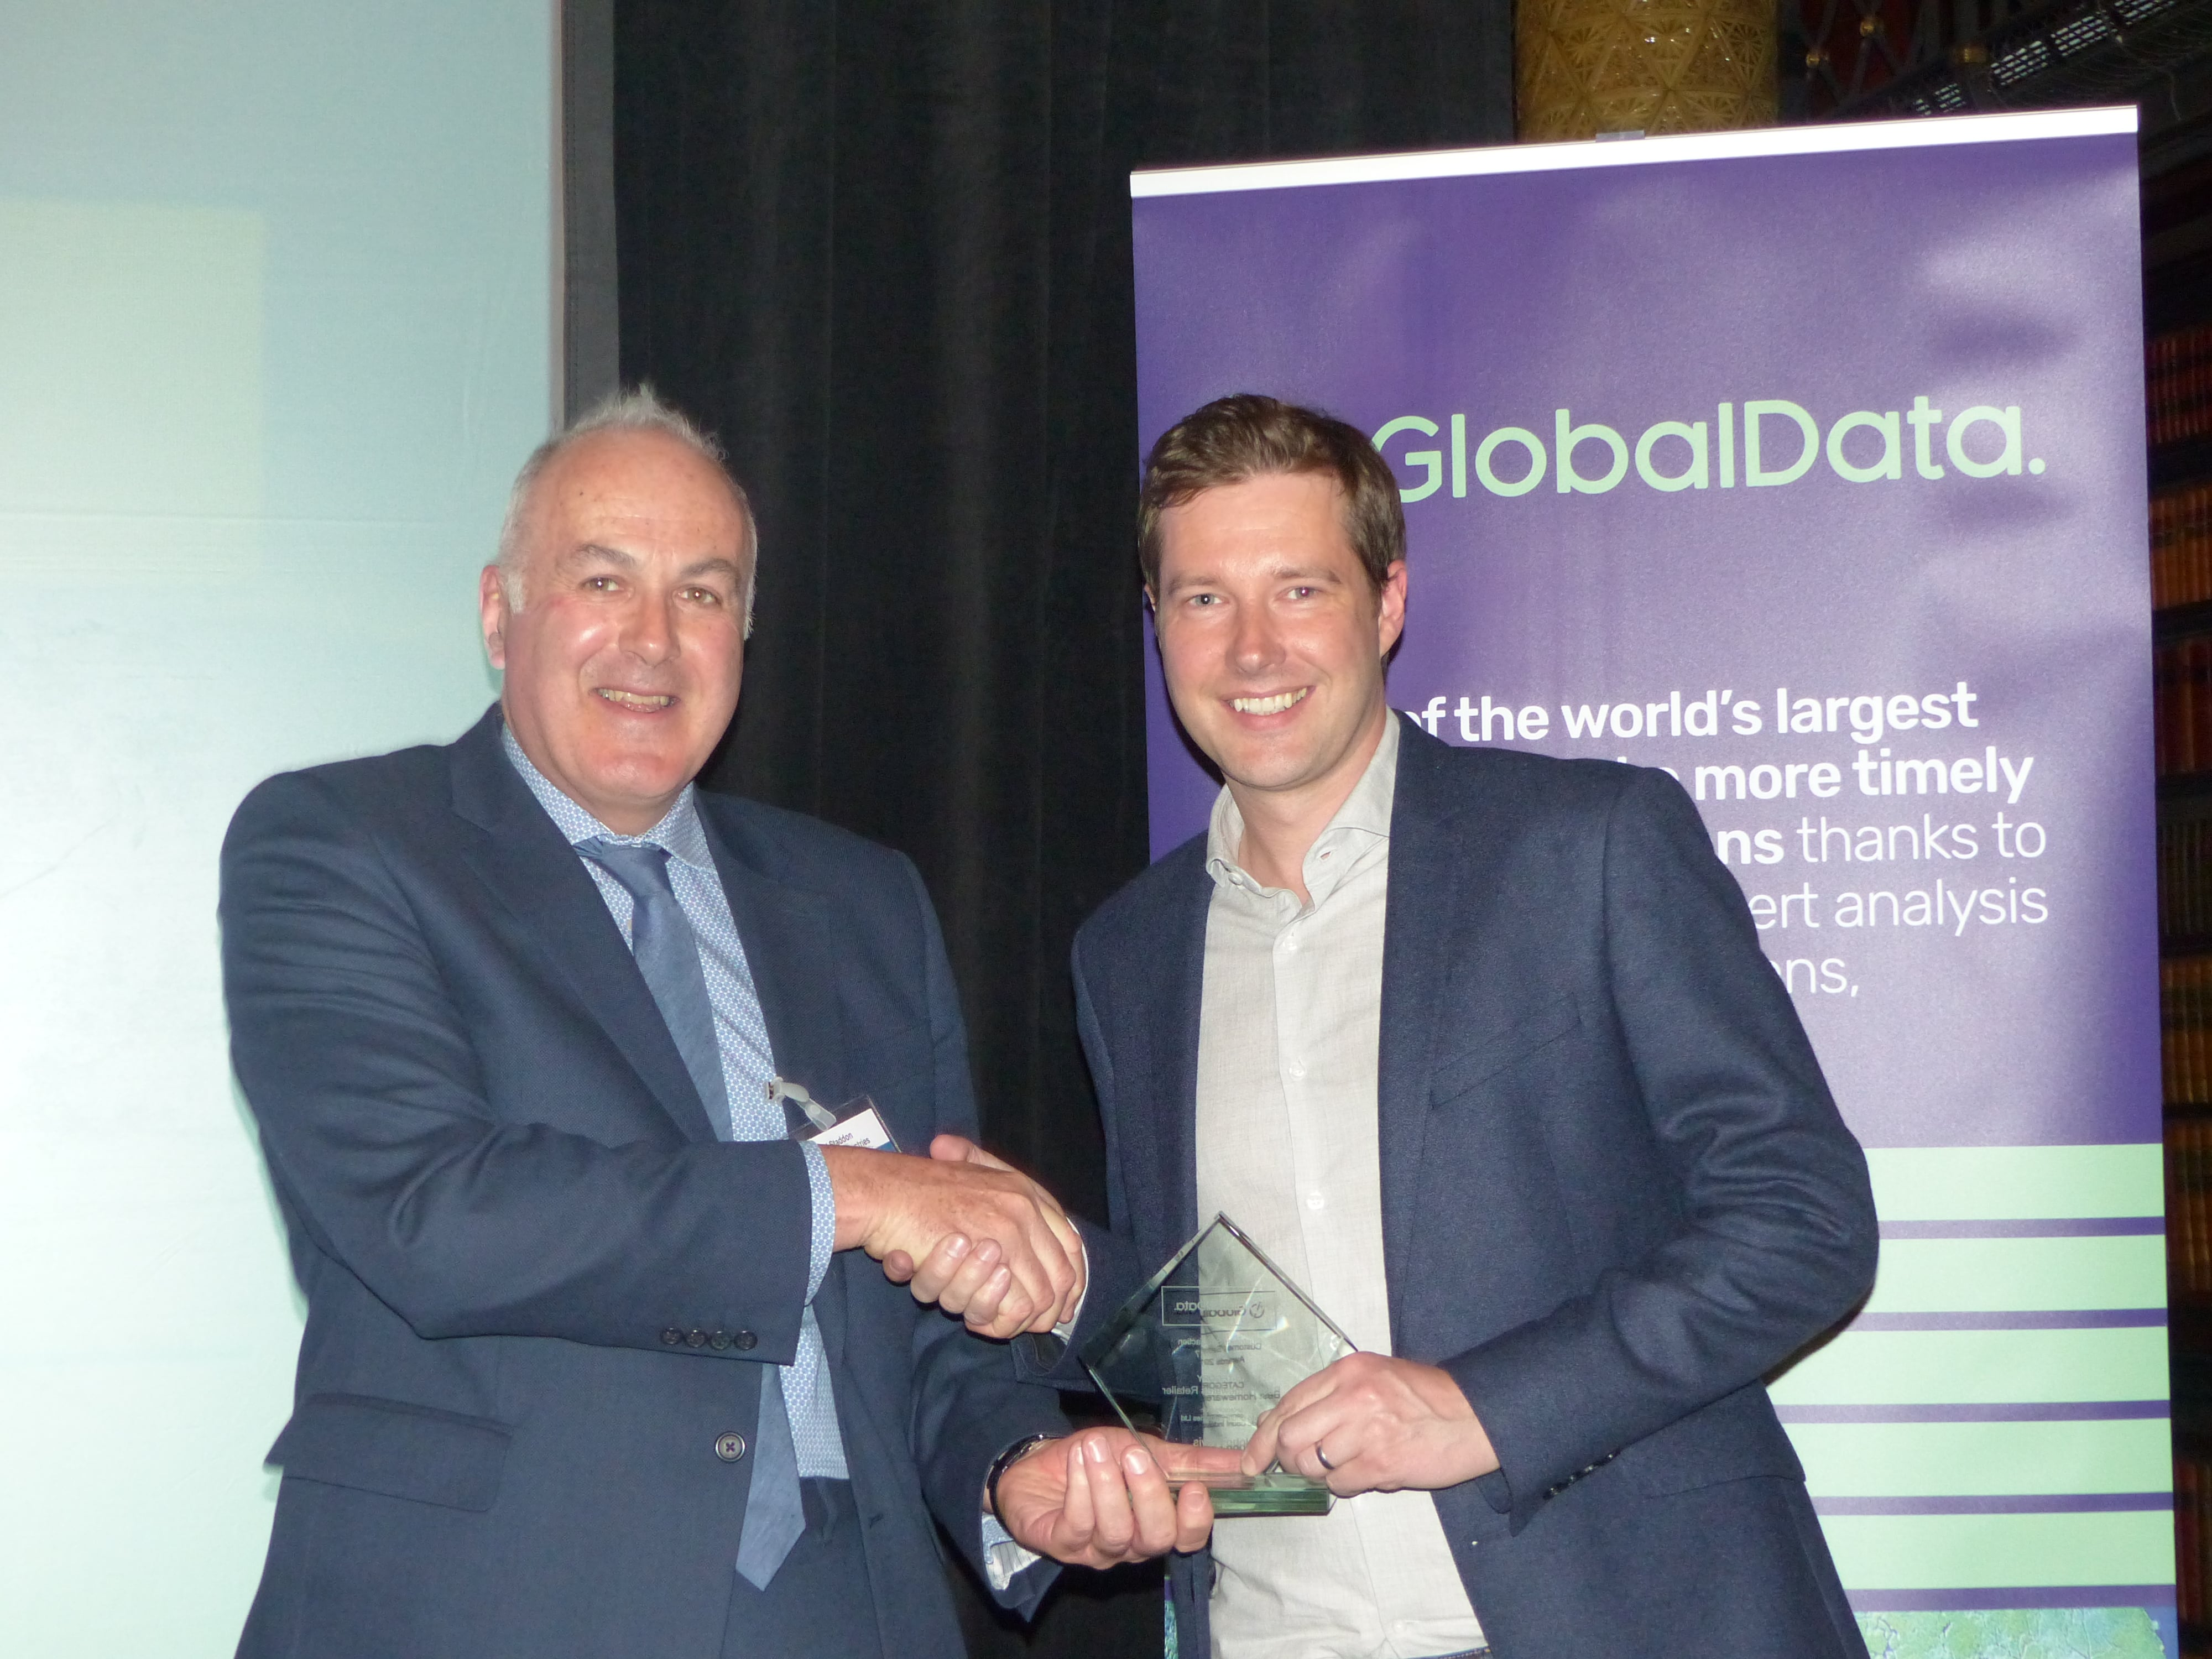 Electricals retailer AO.com named Best UK Retailer at GlobalData's Awards